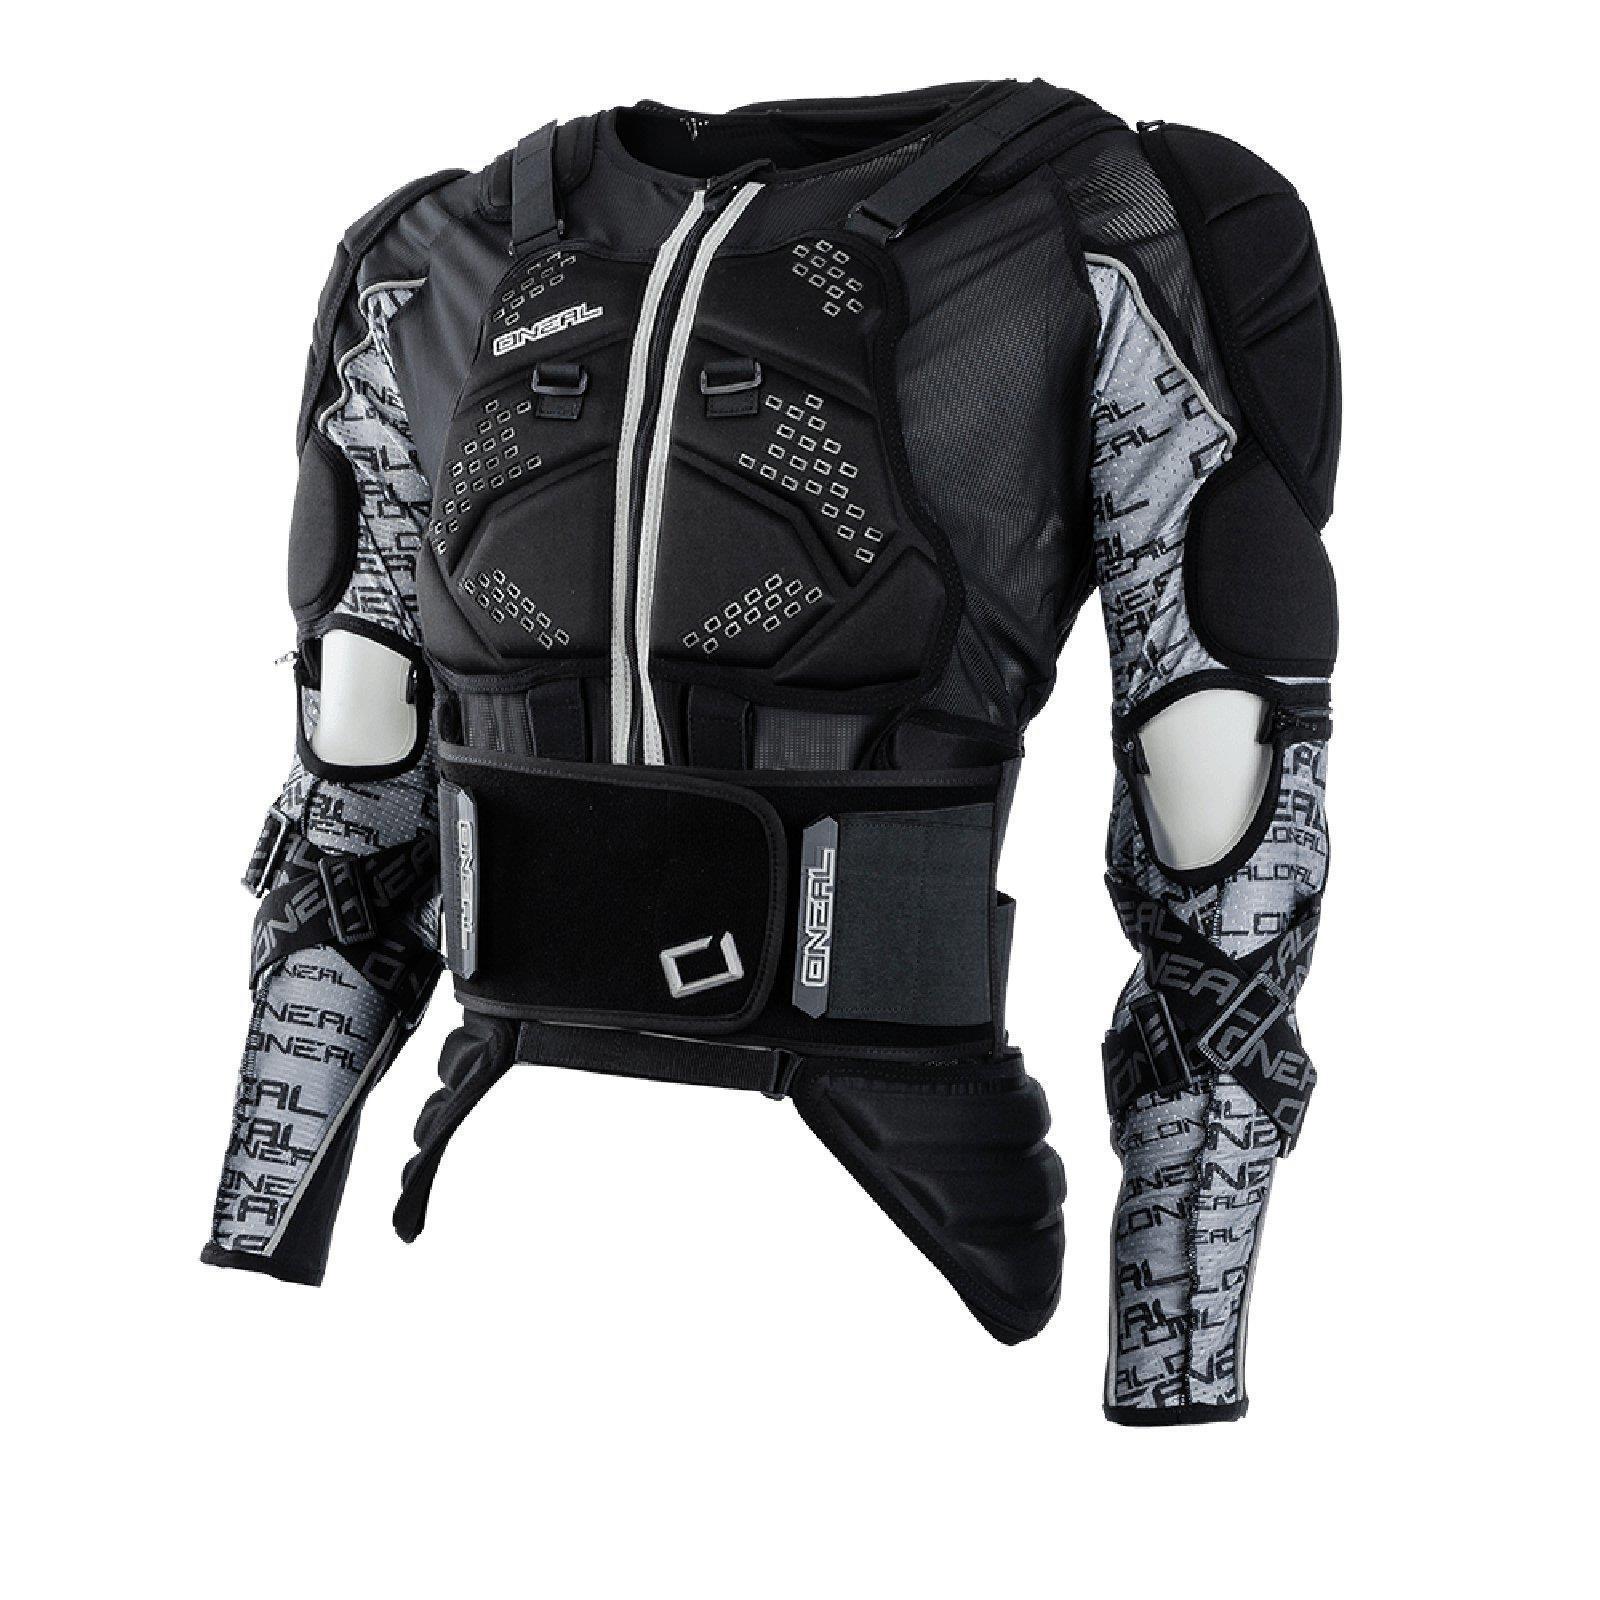 ONeal MadAss Moveo projoector chaqueta armadura de pecho negro Moto cross MX DH MTB FR